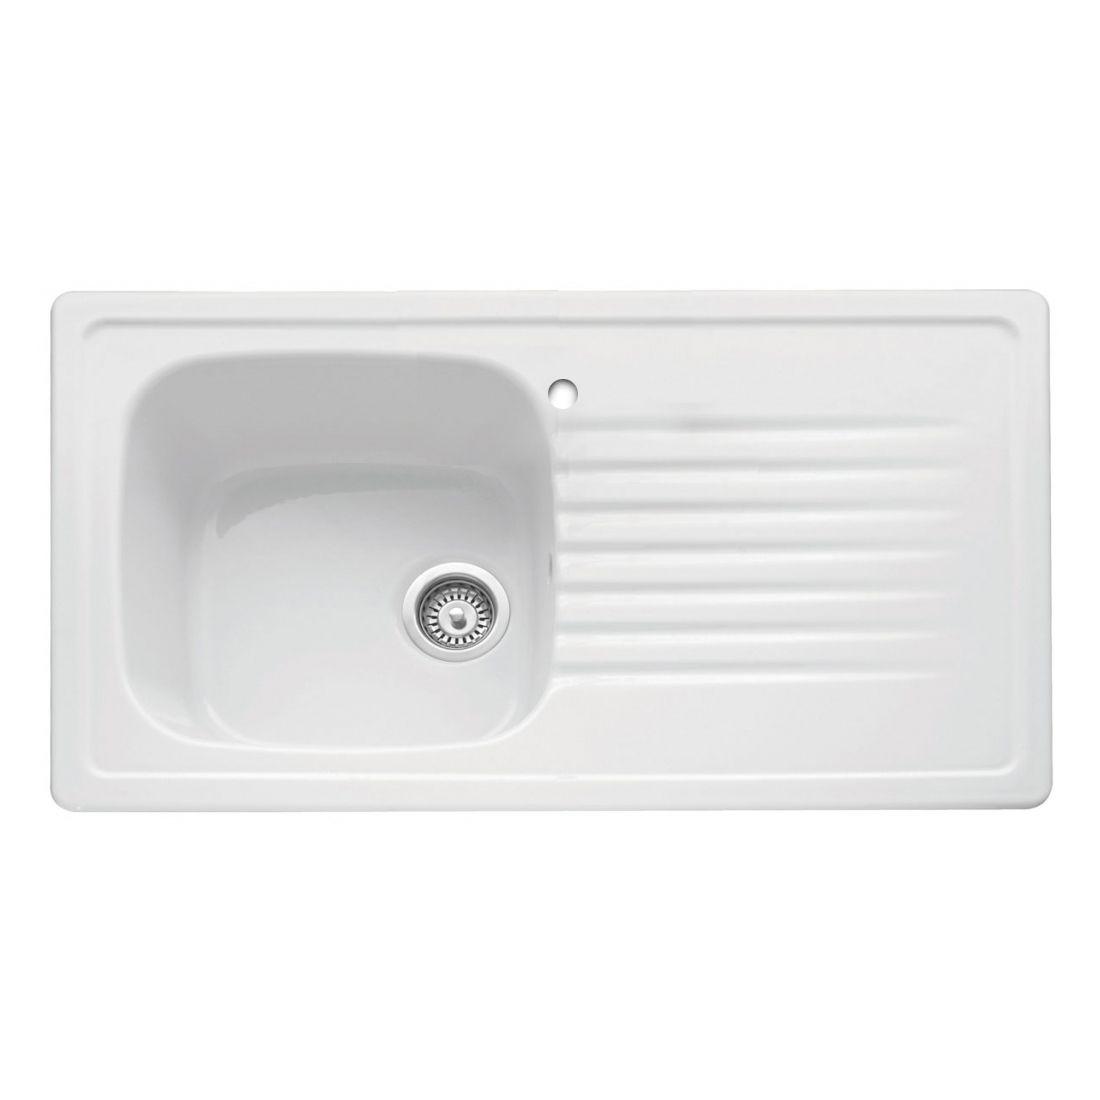 Bluci ASHTON 100 Ceramic Inset Kitchen Sink - Sinks-Taps.com